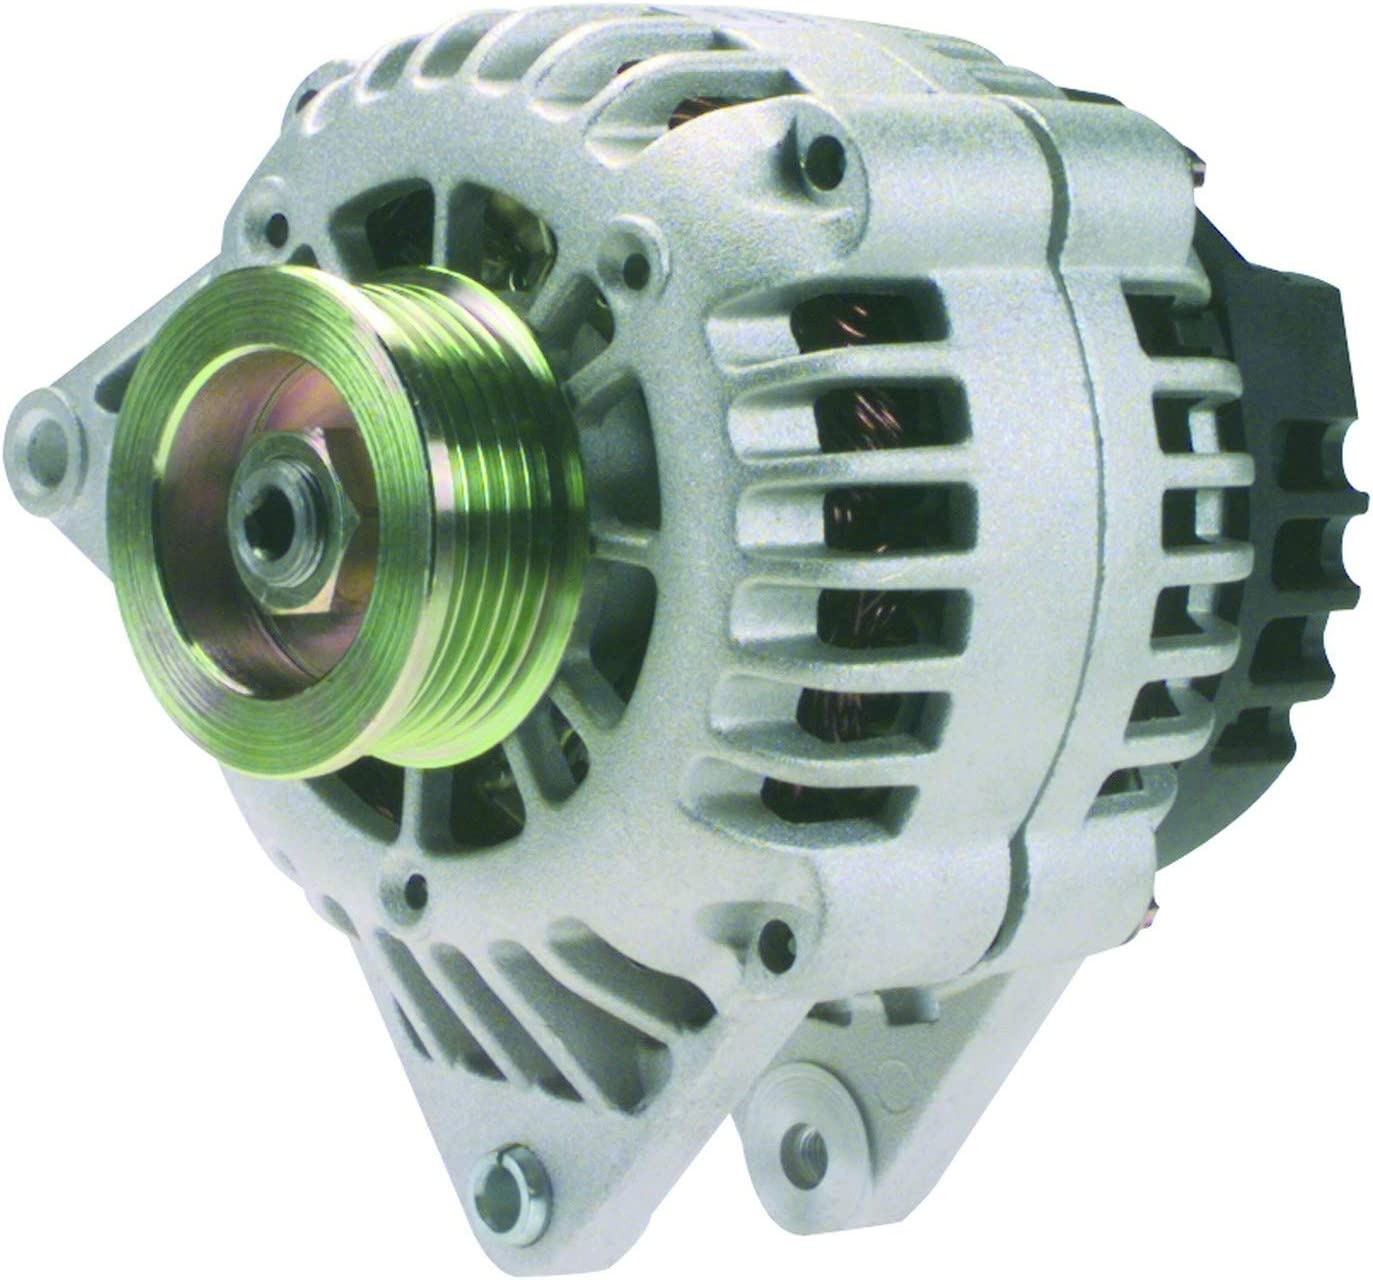 NEW ALTERNATOR 5.7L 5.7 V8 CHEVROLET CAMARO /& PONTIAC FIREBIRD 98 99 00 01 02